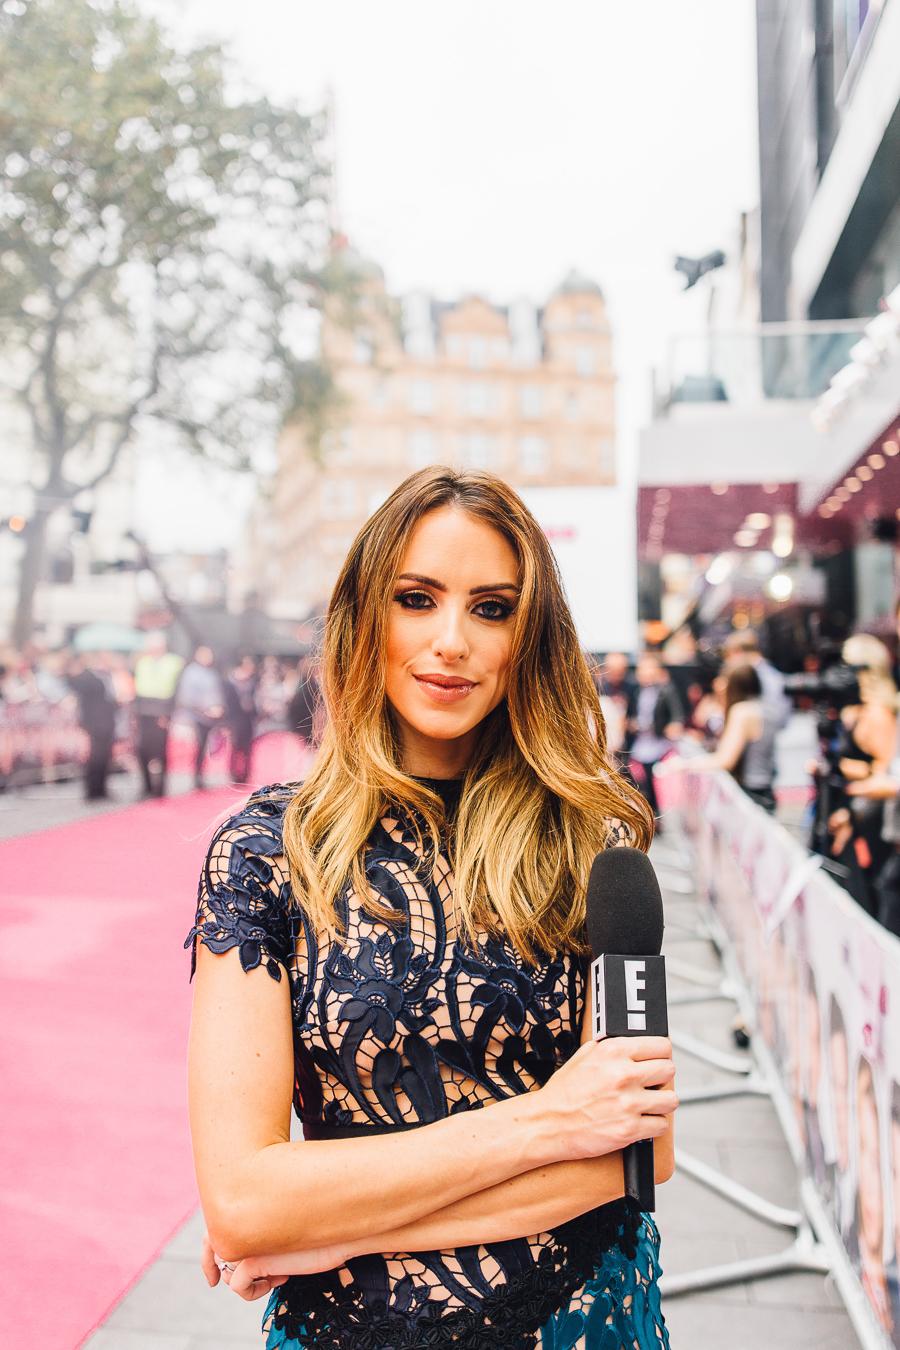 Sabrina Chakici E! UK Ireland - Bridget Jones Baby world premiere - clutch and carry on blog - E! Host UK & Ireland_-26